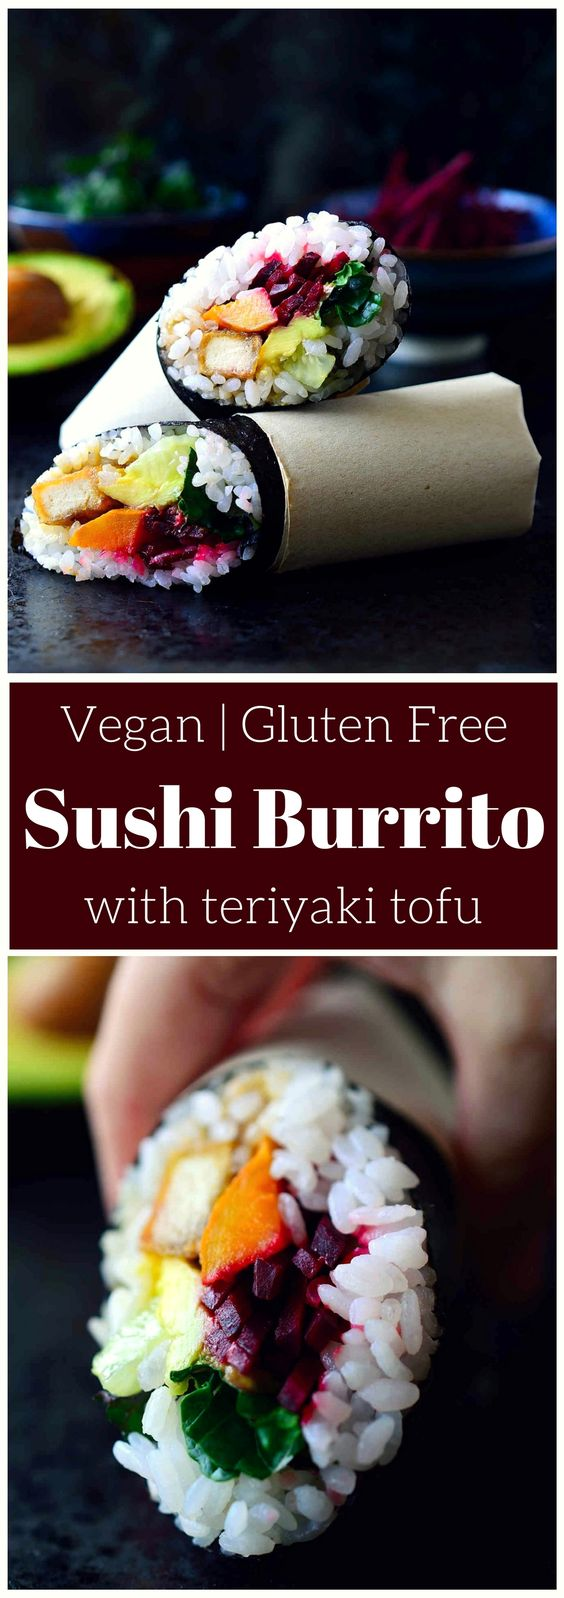 Teriyaki Tofu Sushi Burrito Recipe